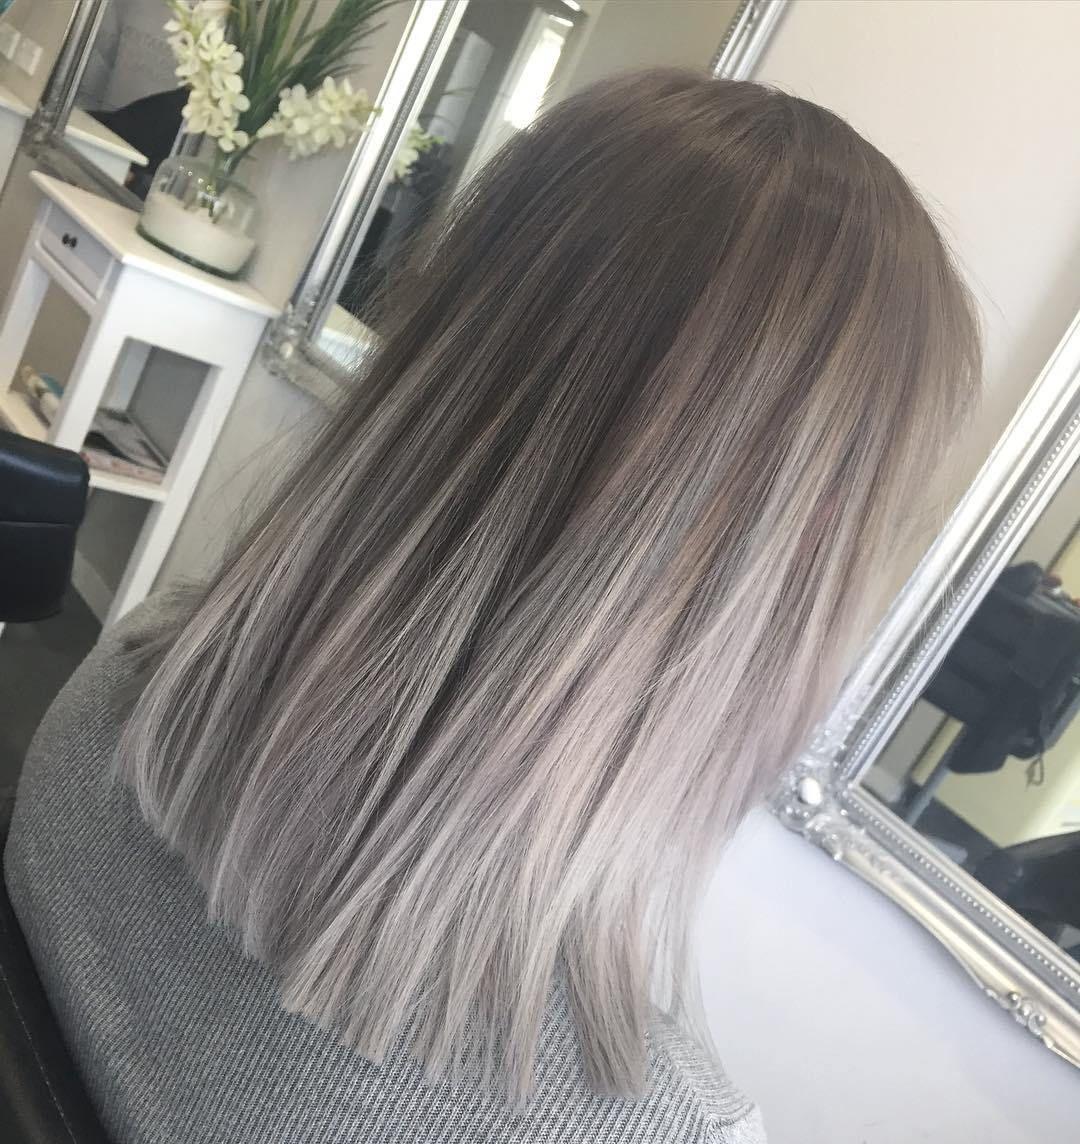 70 Flattering Balayage Hair Color Ideas For 2020 Hair Color Hair Styles Balayage Hair